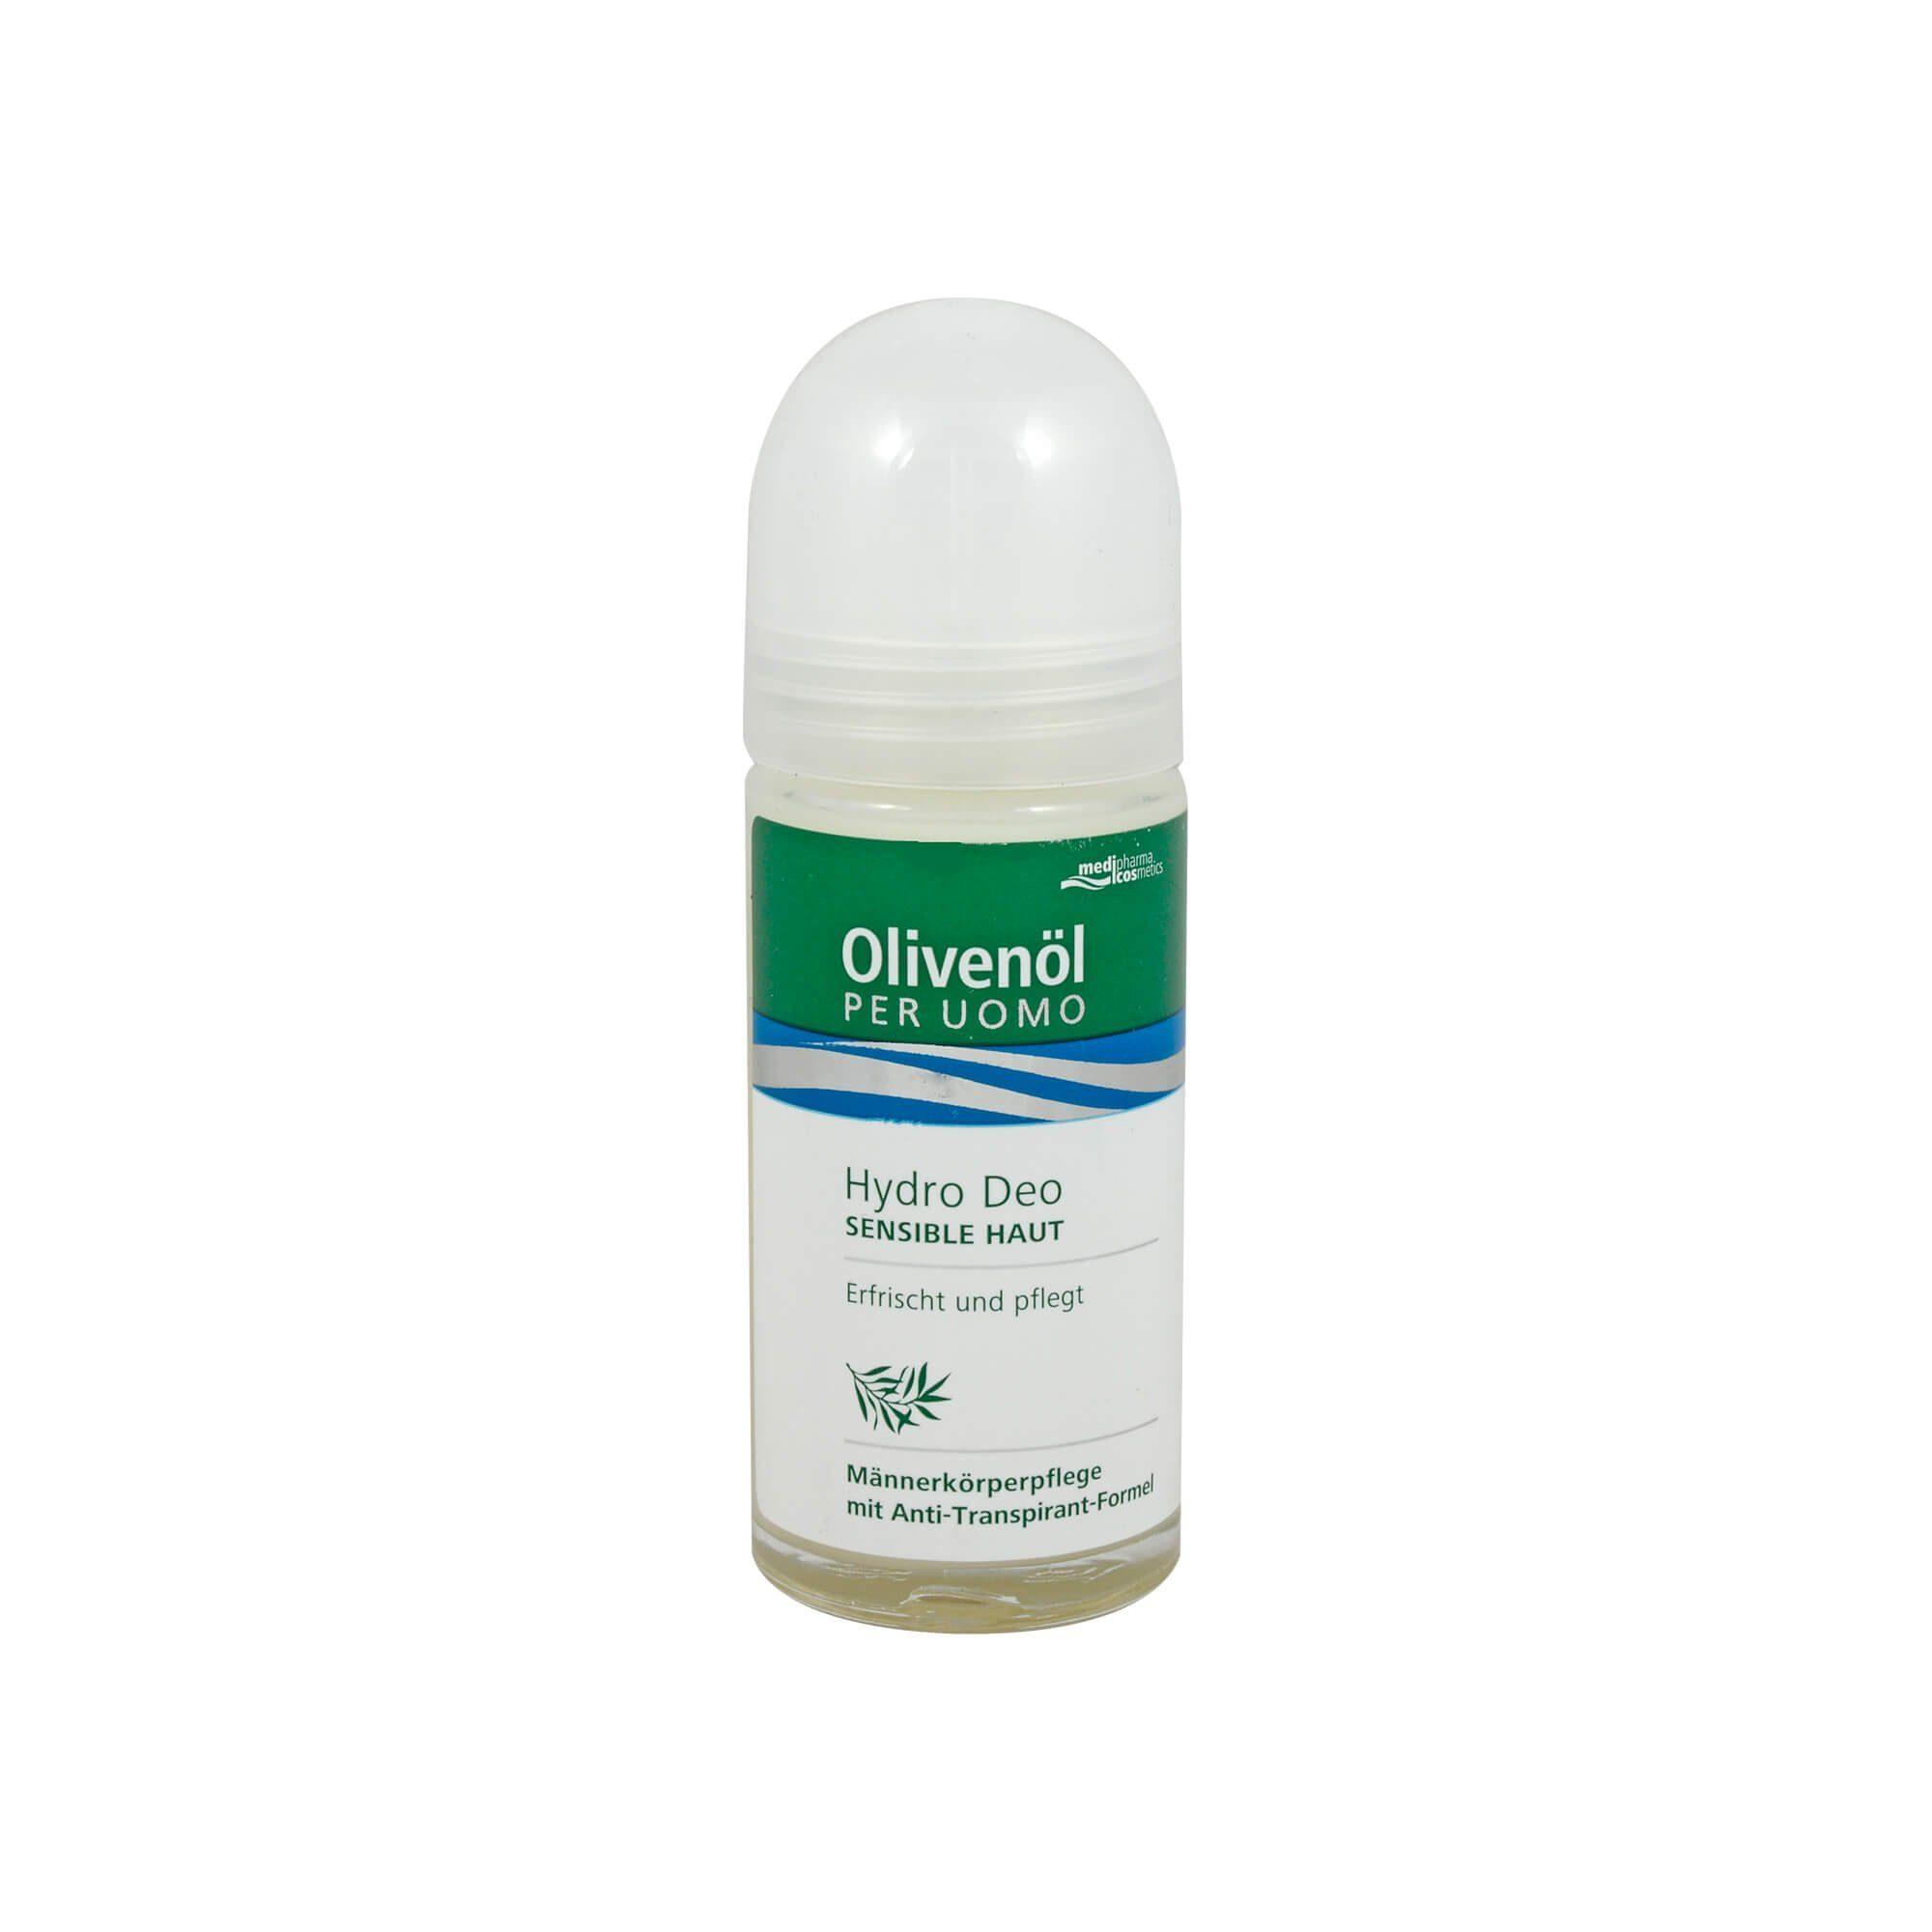 Olivenöl Per Uomo Hydro Deo , 50 ml